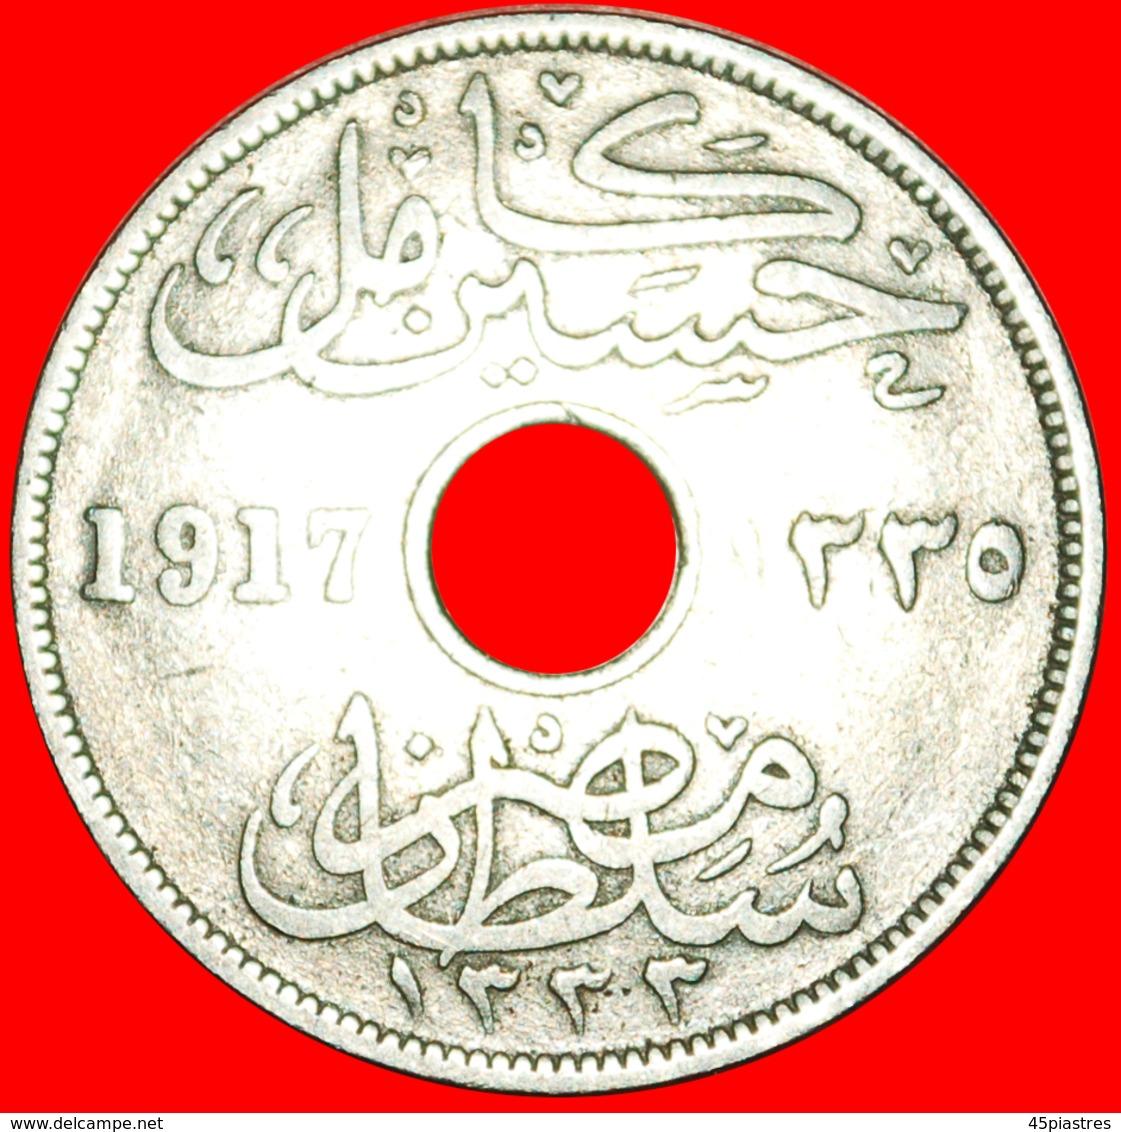 √ GREAT BRITAIN: EGYPT ★ 10 MILLIEMES 1335-1917 KN! LOW START ★  NO RESERVE! - Egitto